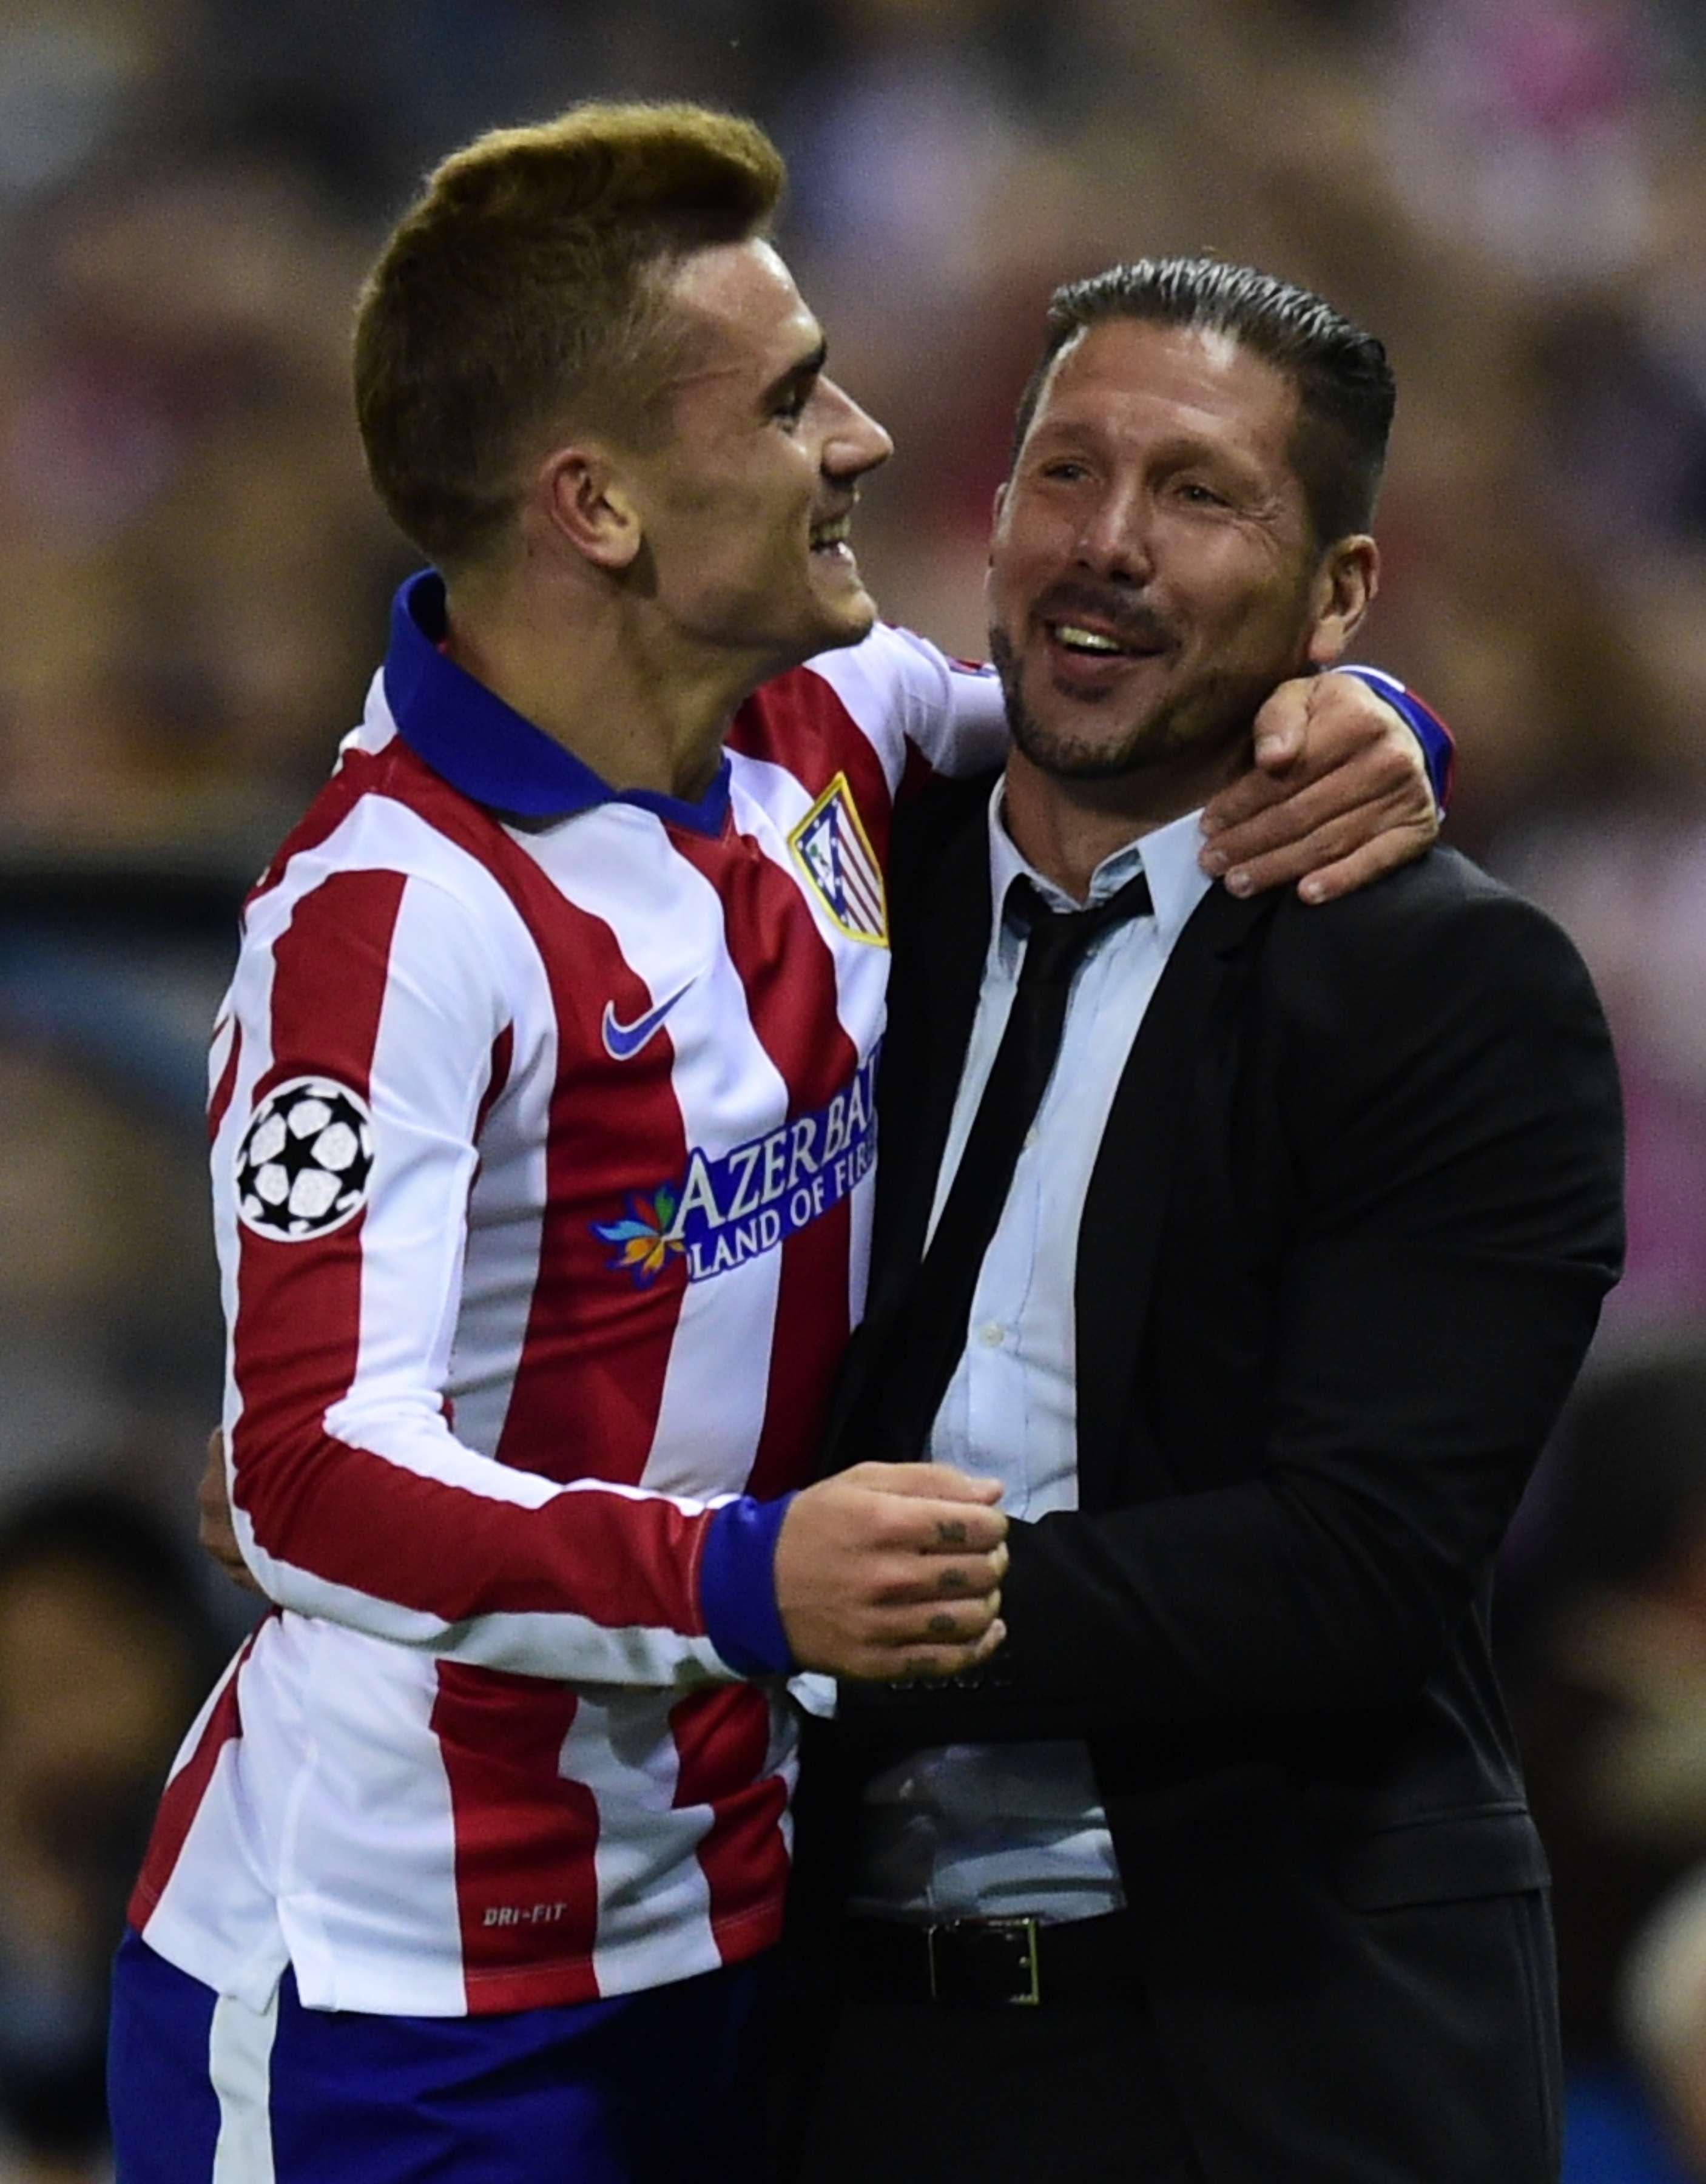 Grizmann abraça Siemone após deixar sua marca na partida Foto: Javier Soriano/AFP